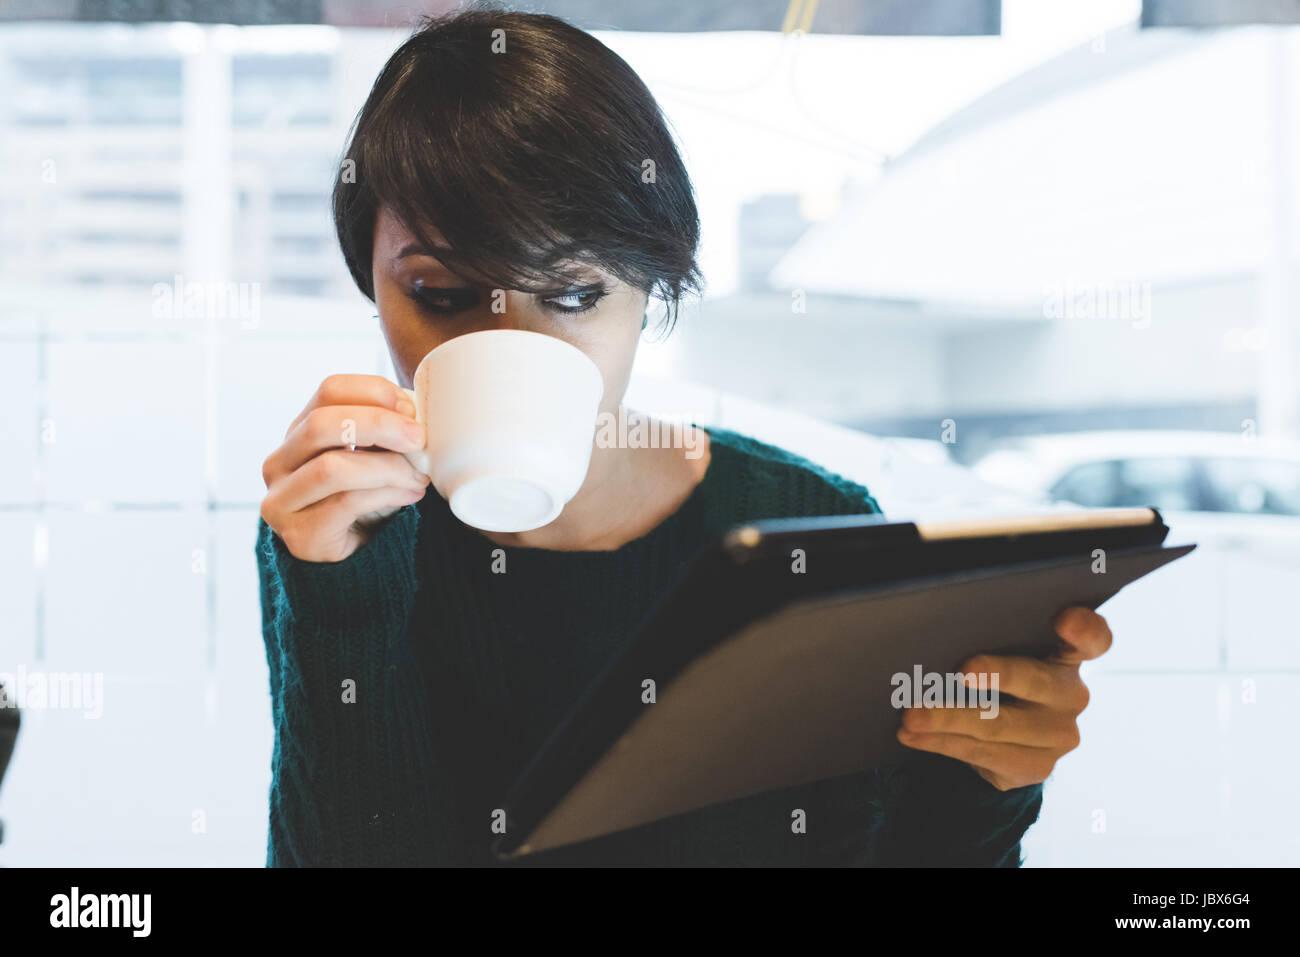 Woman in cafe looking at digital tablet et boire du café Photo Stock